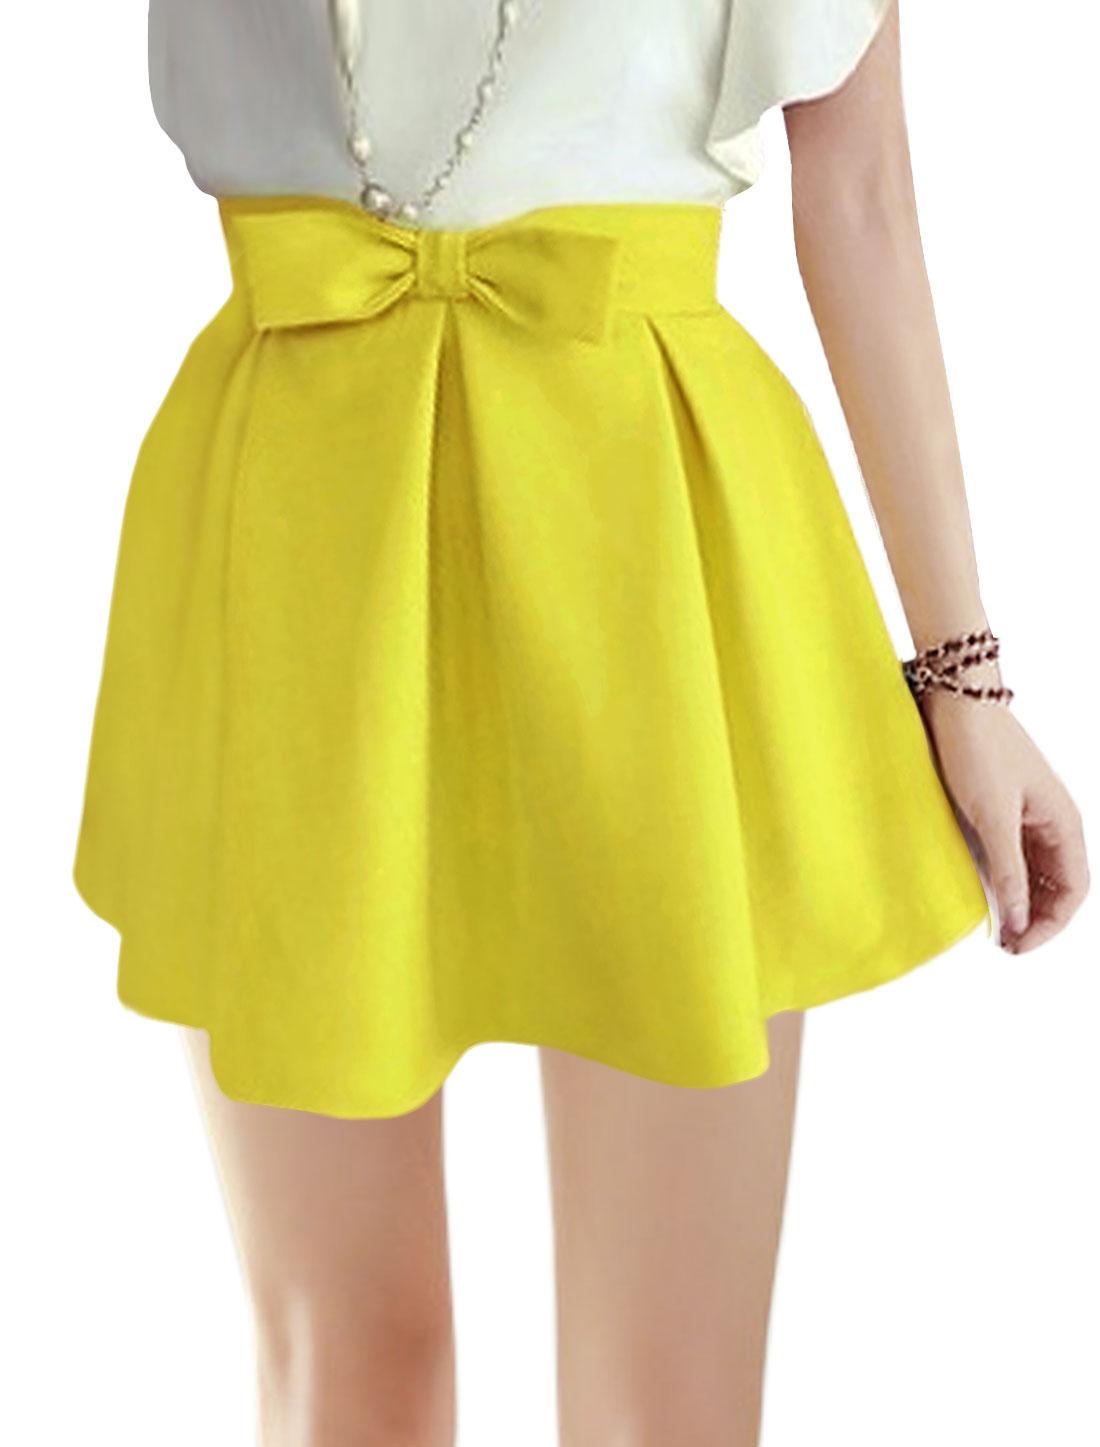 Lady Natural Waist Bowknot Decor Pleated Mini Skirts Yellow M